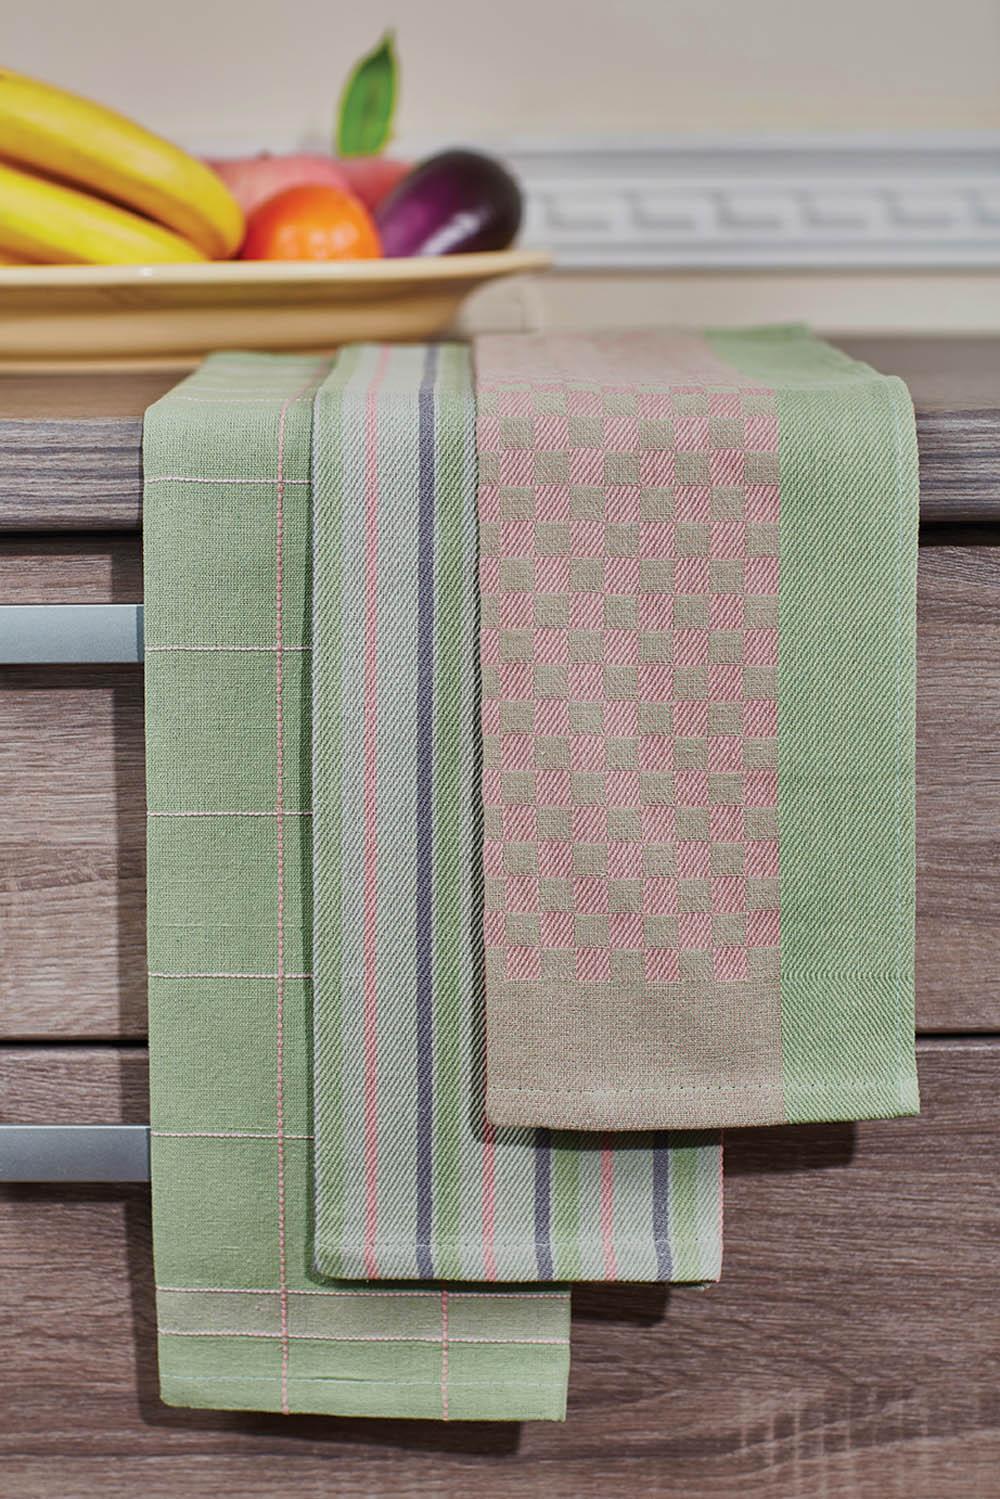 {} Primavelle Кухонное полотенце Jaycee Цвет: Зеленый (40х60 см - 3 шт) полотенце кухонное soavita цвет светло зеленый 40 х 60 см 48803